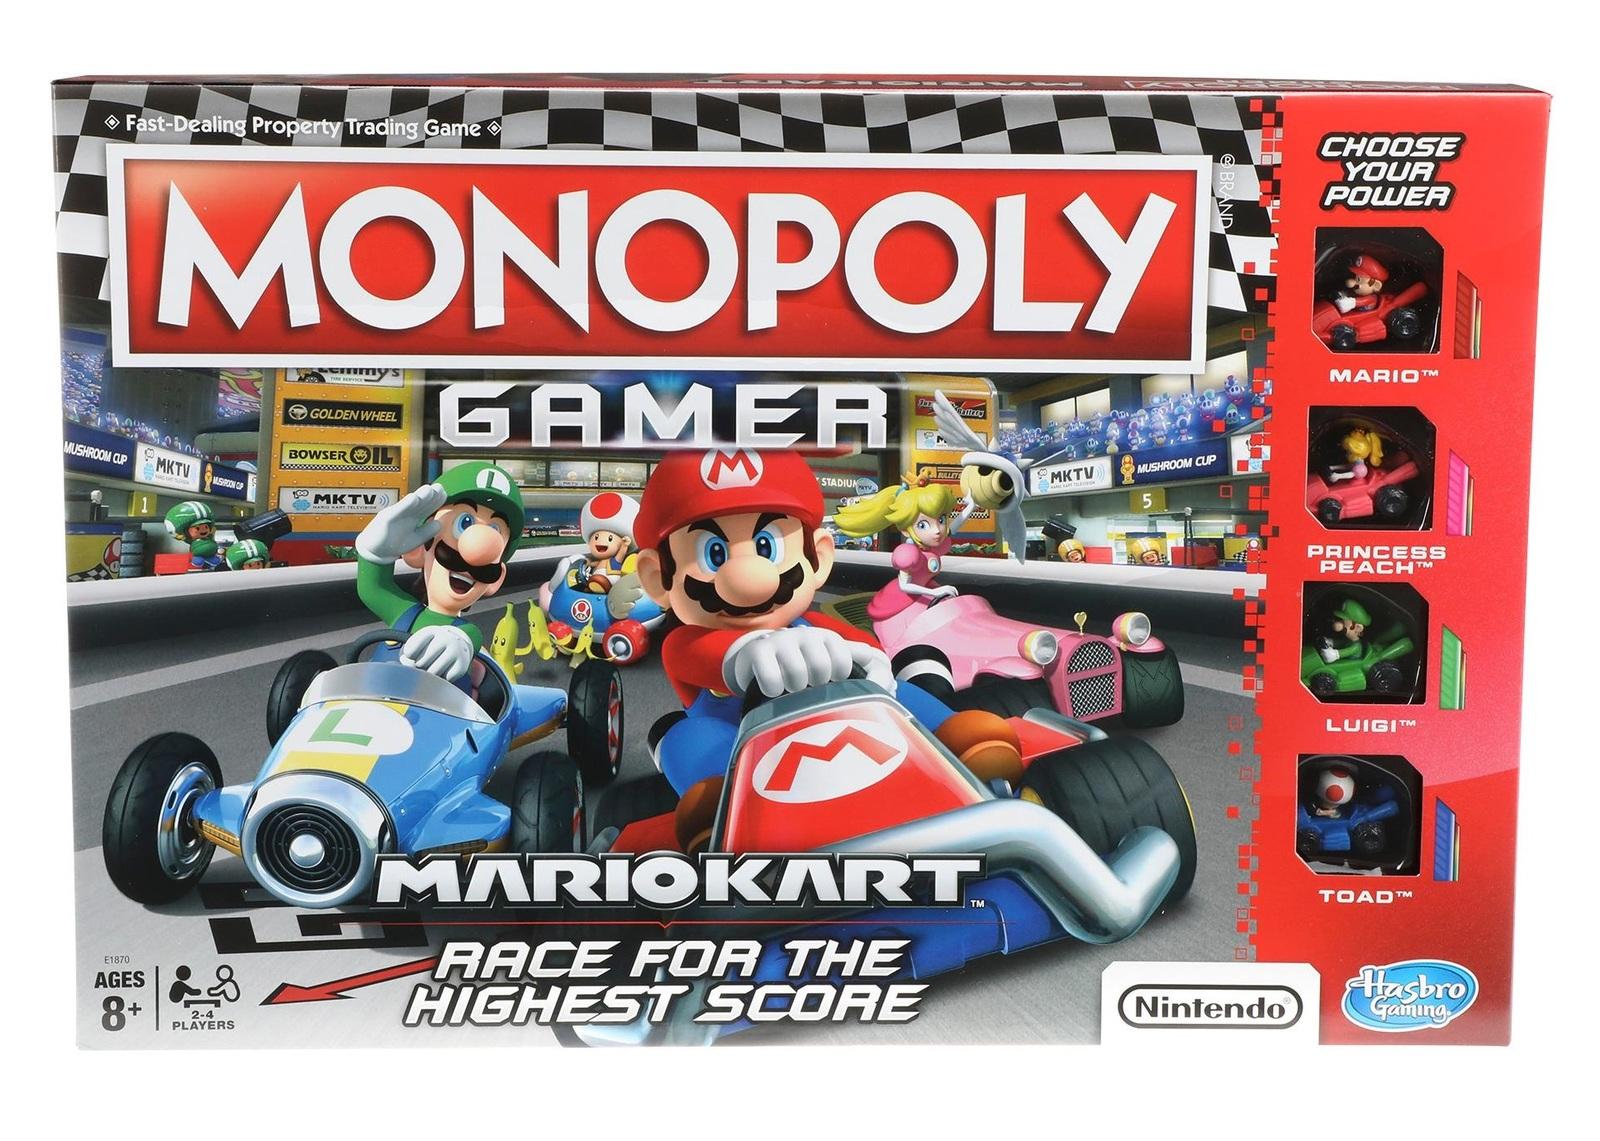 Monopoly: Gamer - Mario Kart Edition image